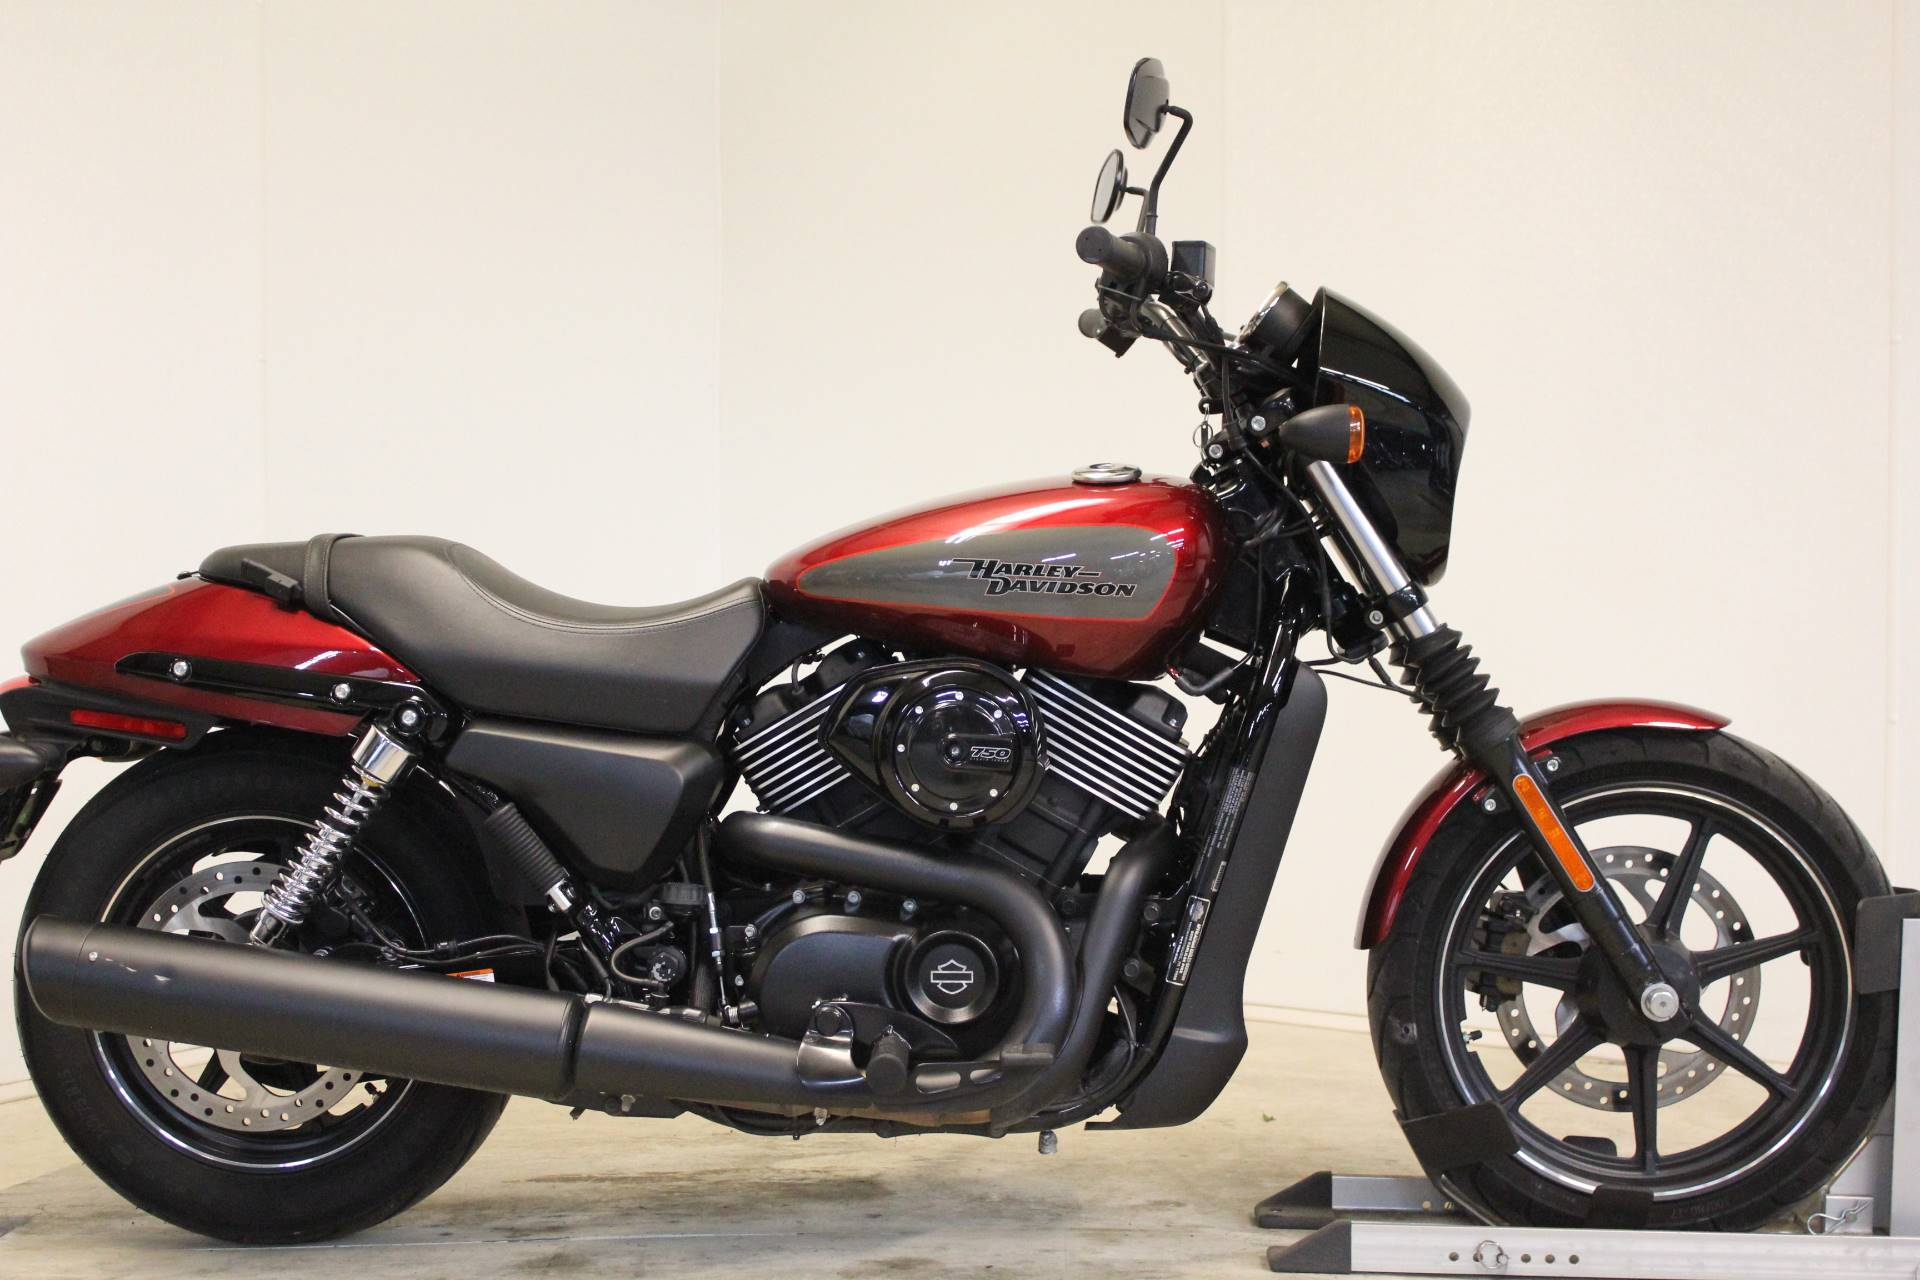 2017 Harley-Davidson Street 750 1